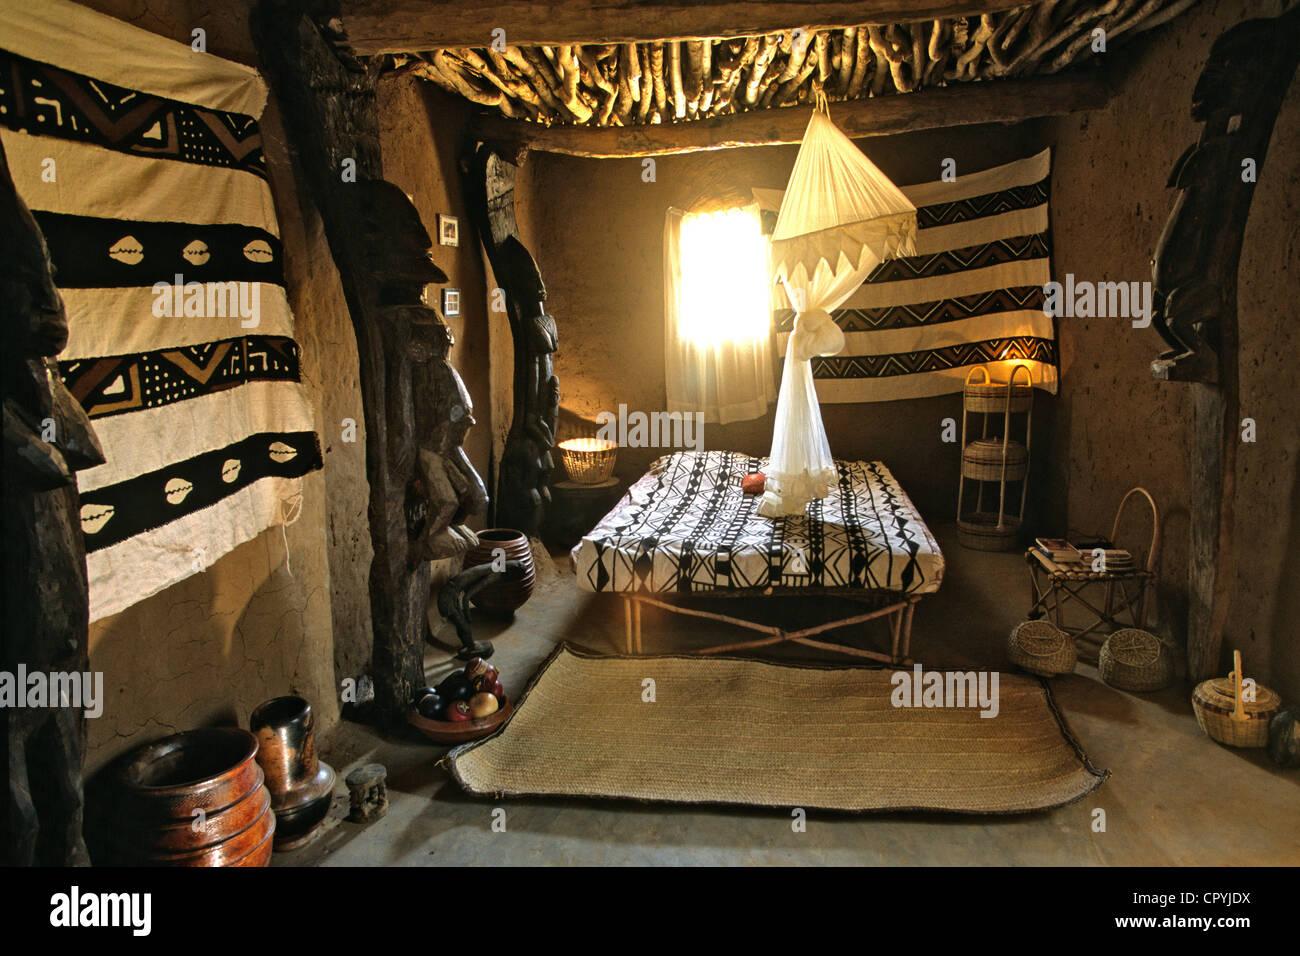 Mali, Pays Dogon, Ennde, prix du camp Alakala Photo Stock